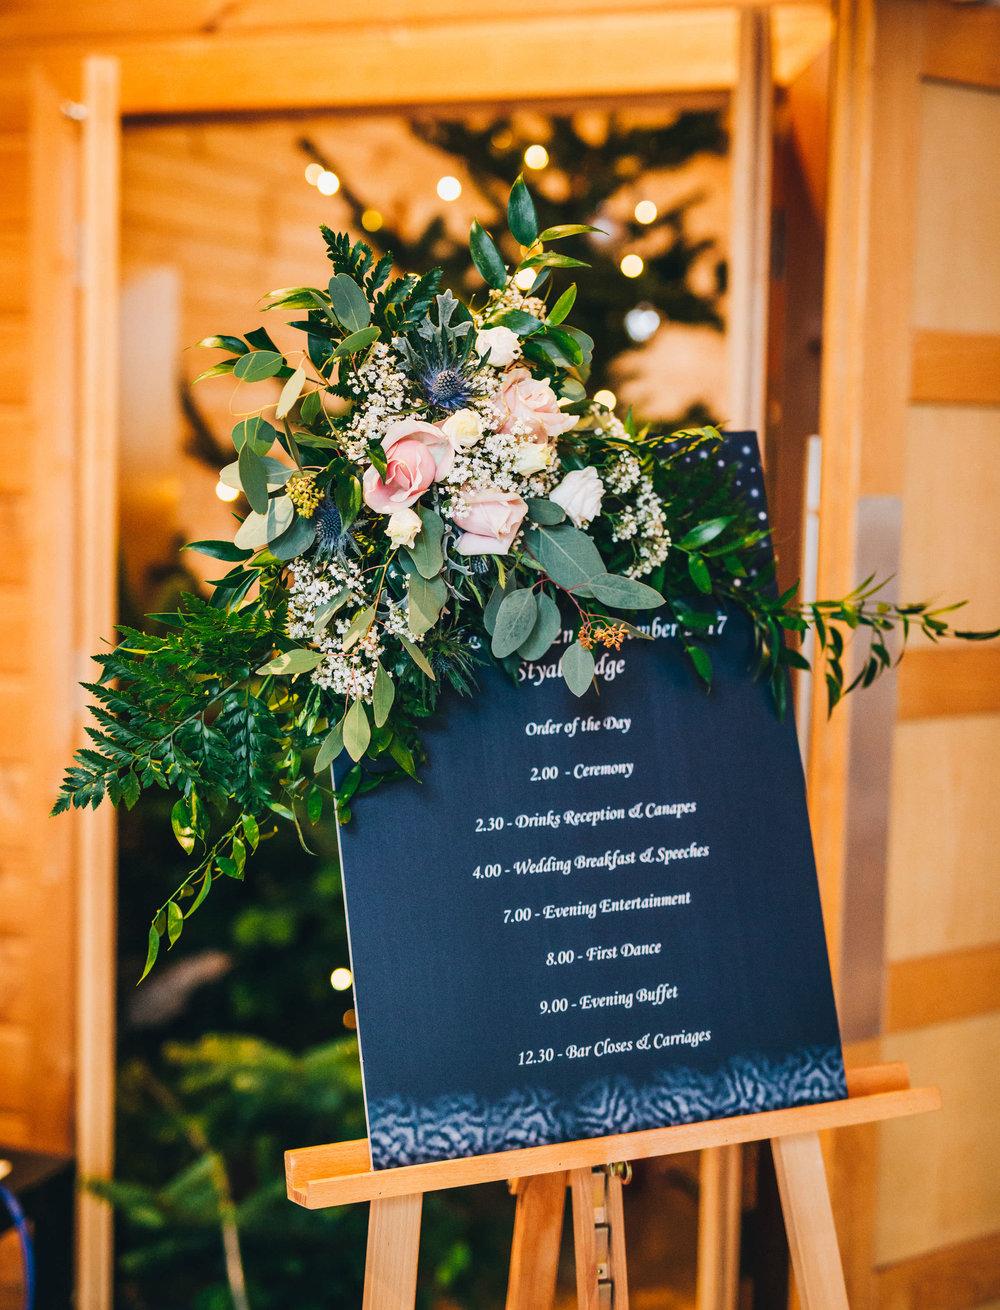 table plan at styal lodge wedding